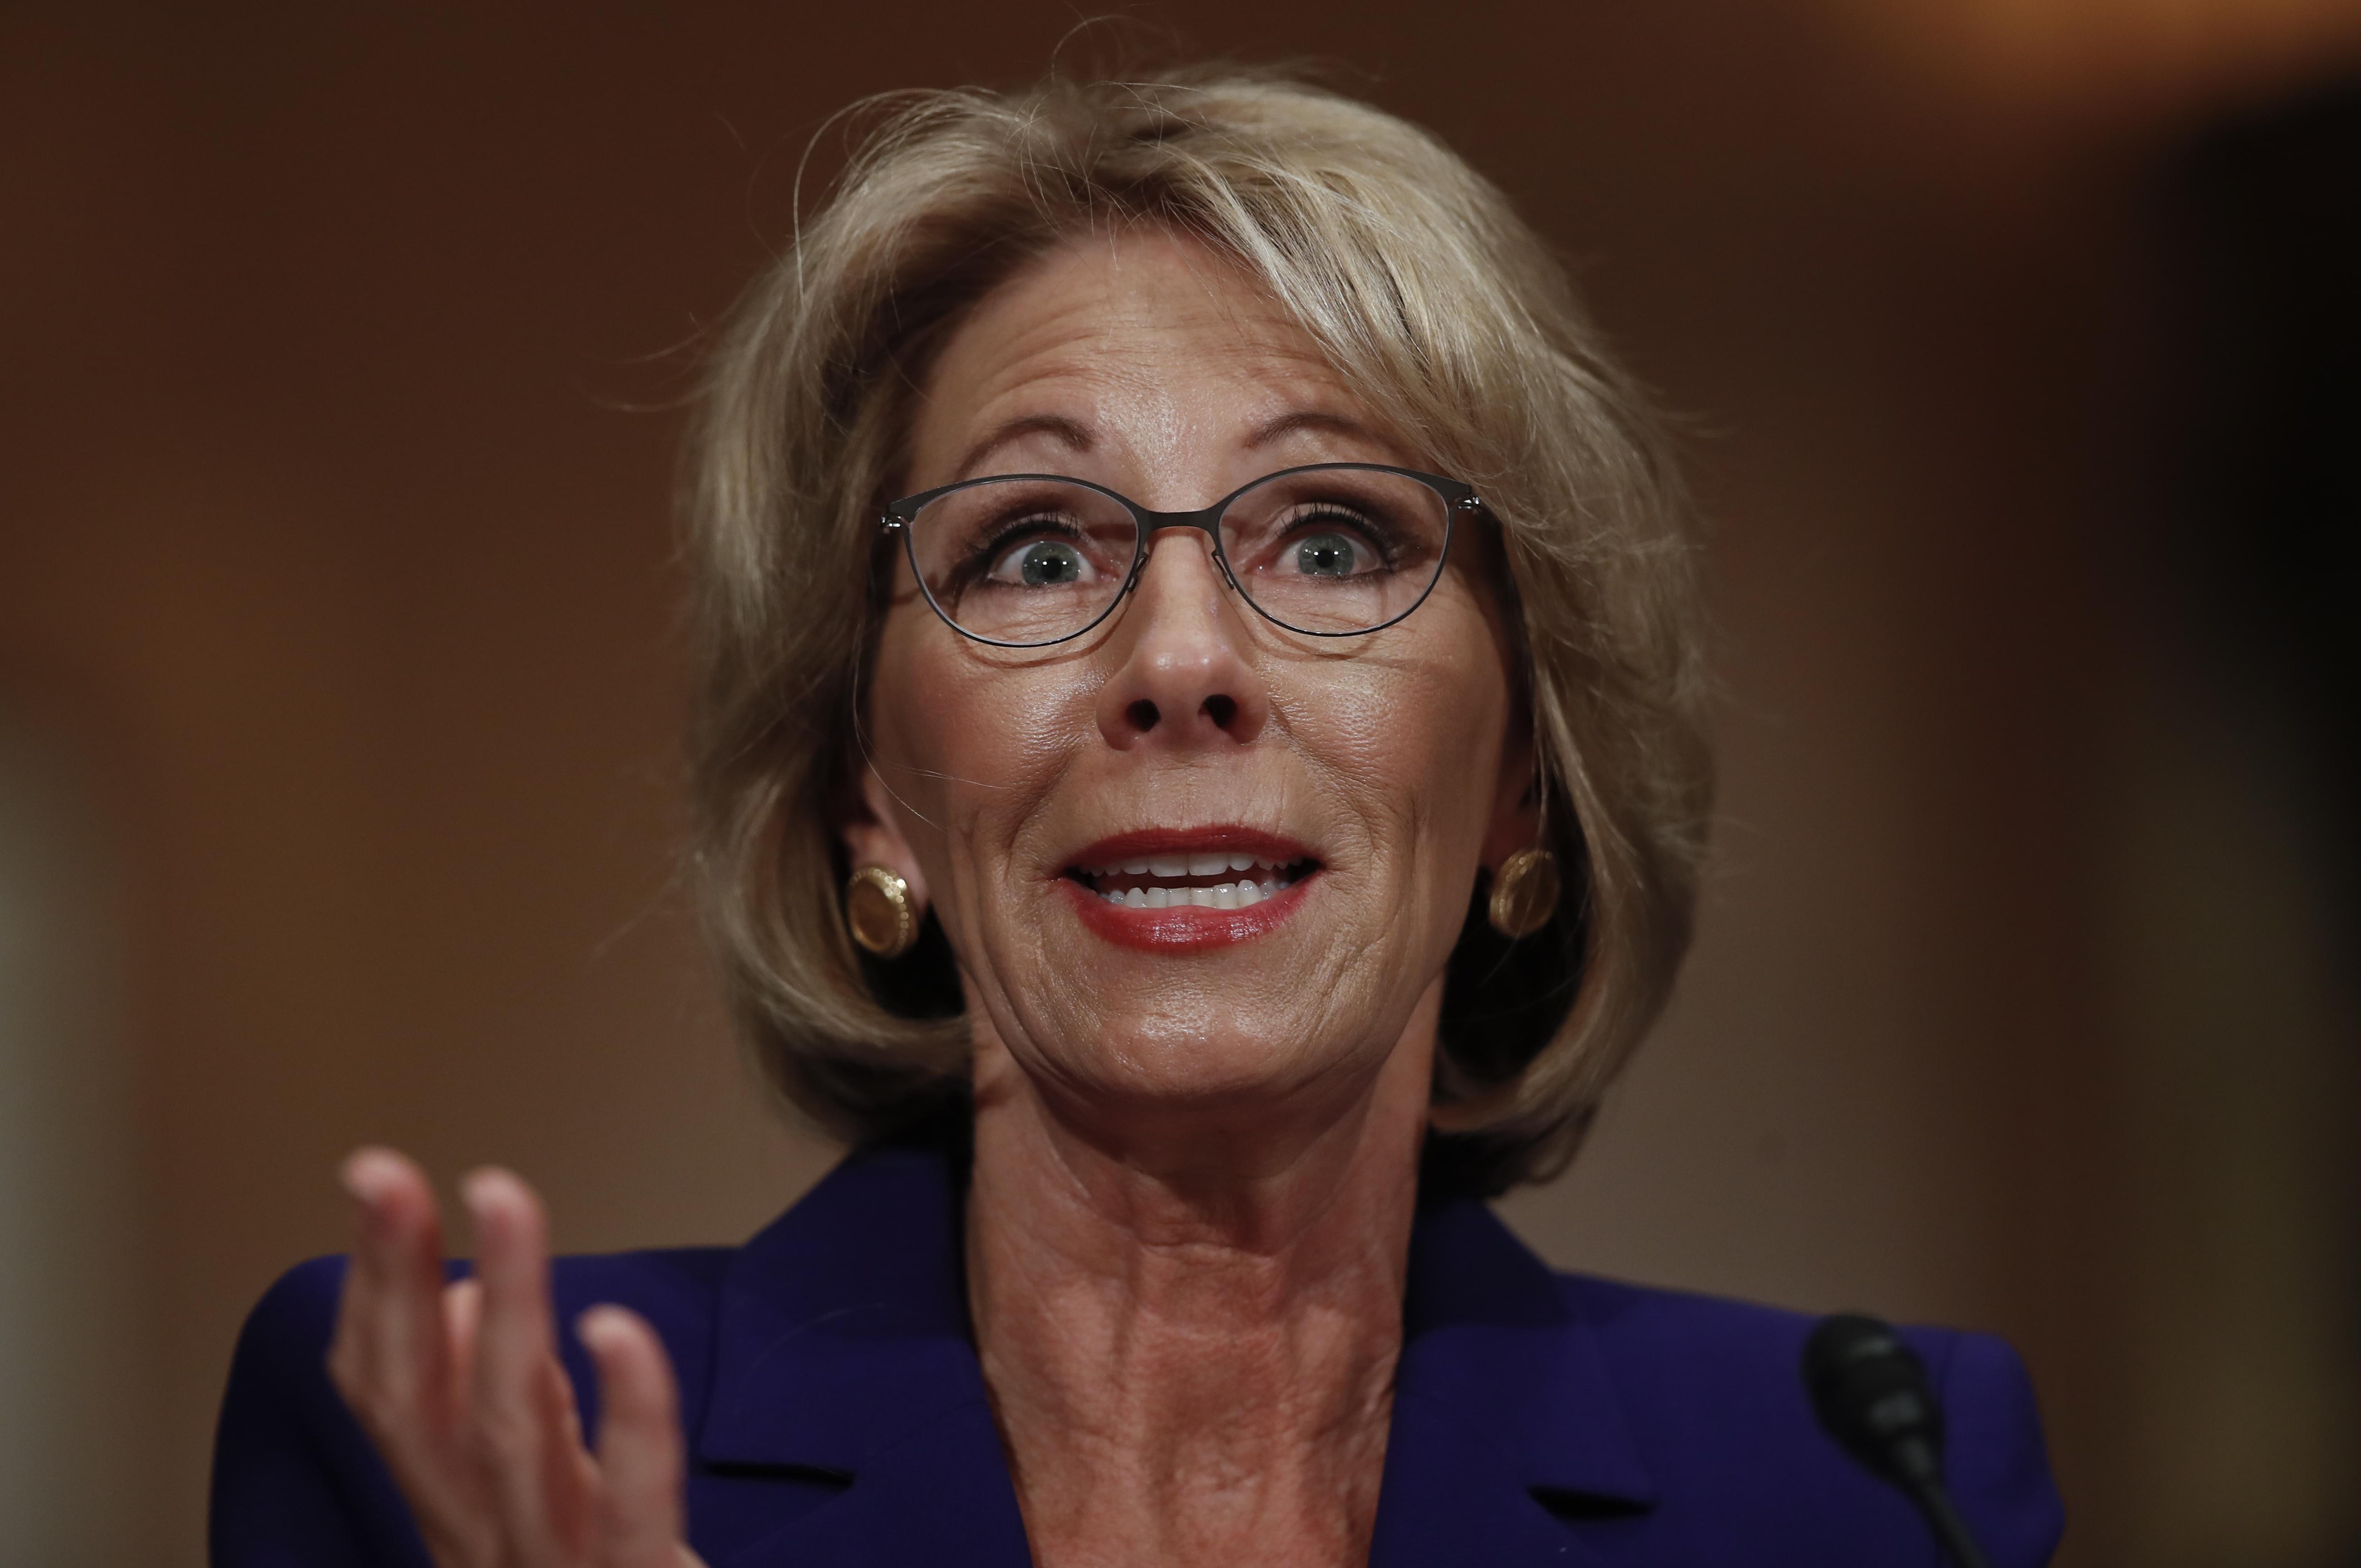 Betsy DeVos, who was confirmed as U-S Education Secretary by the Senate on Tuesday, Feb. 7th.